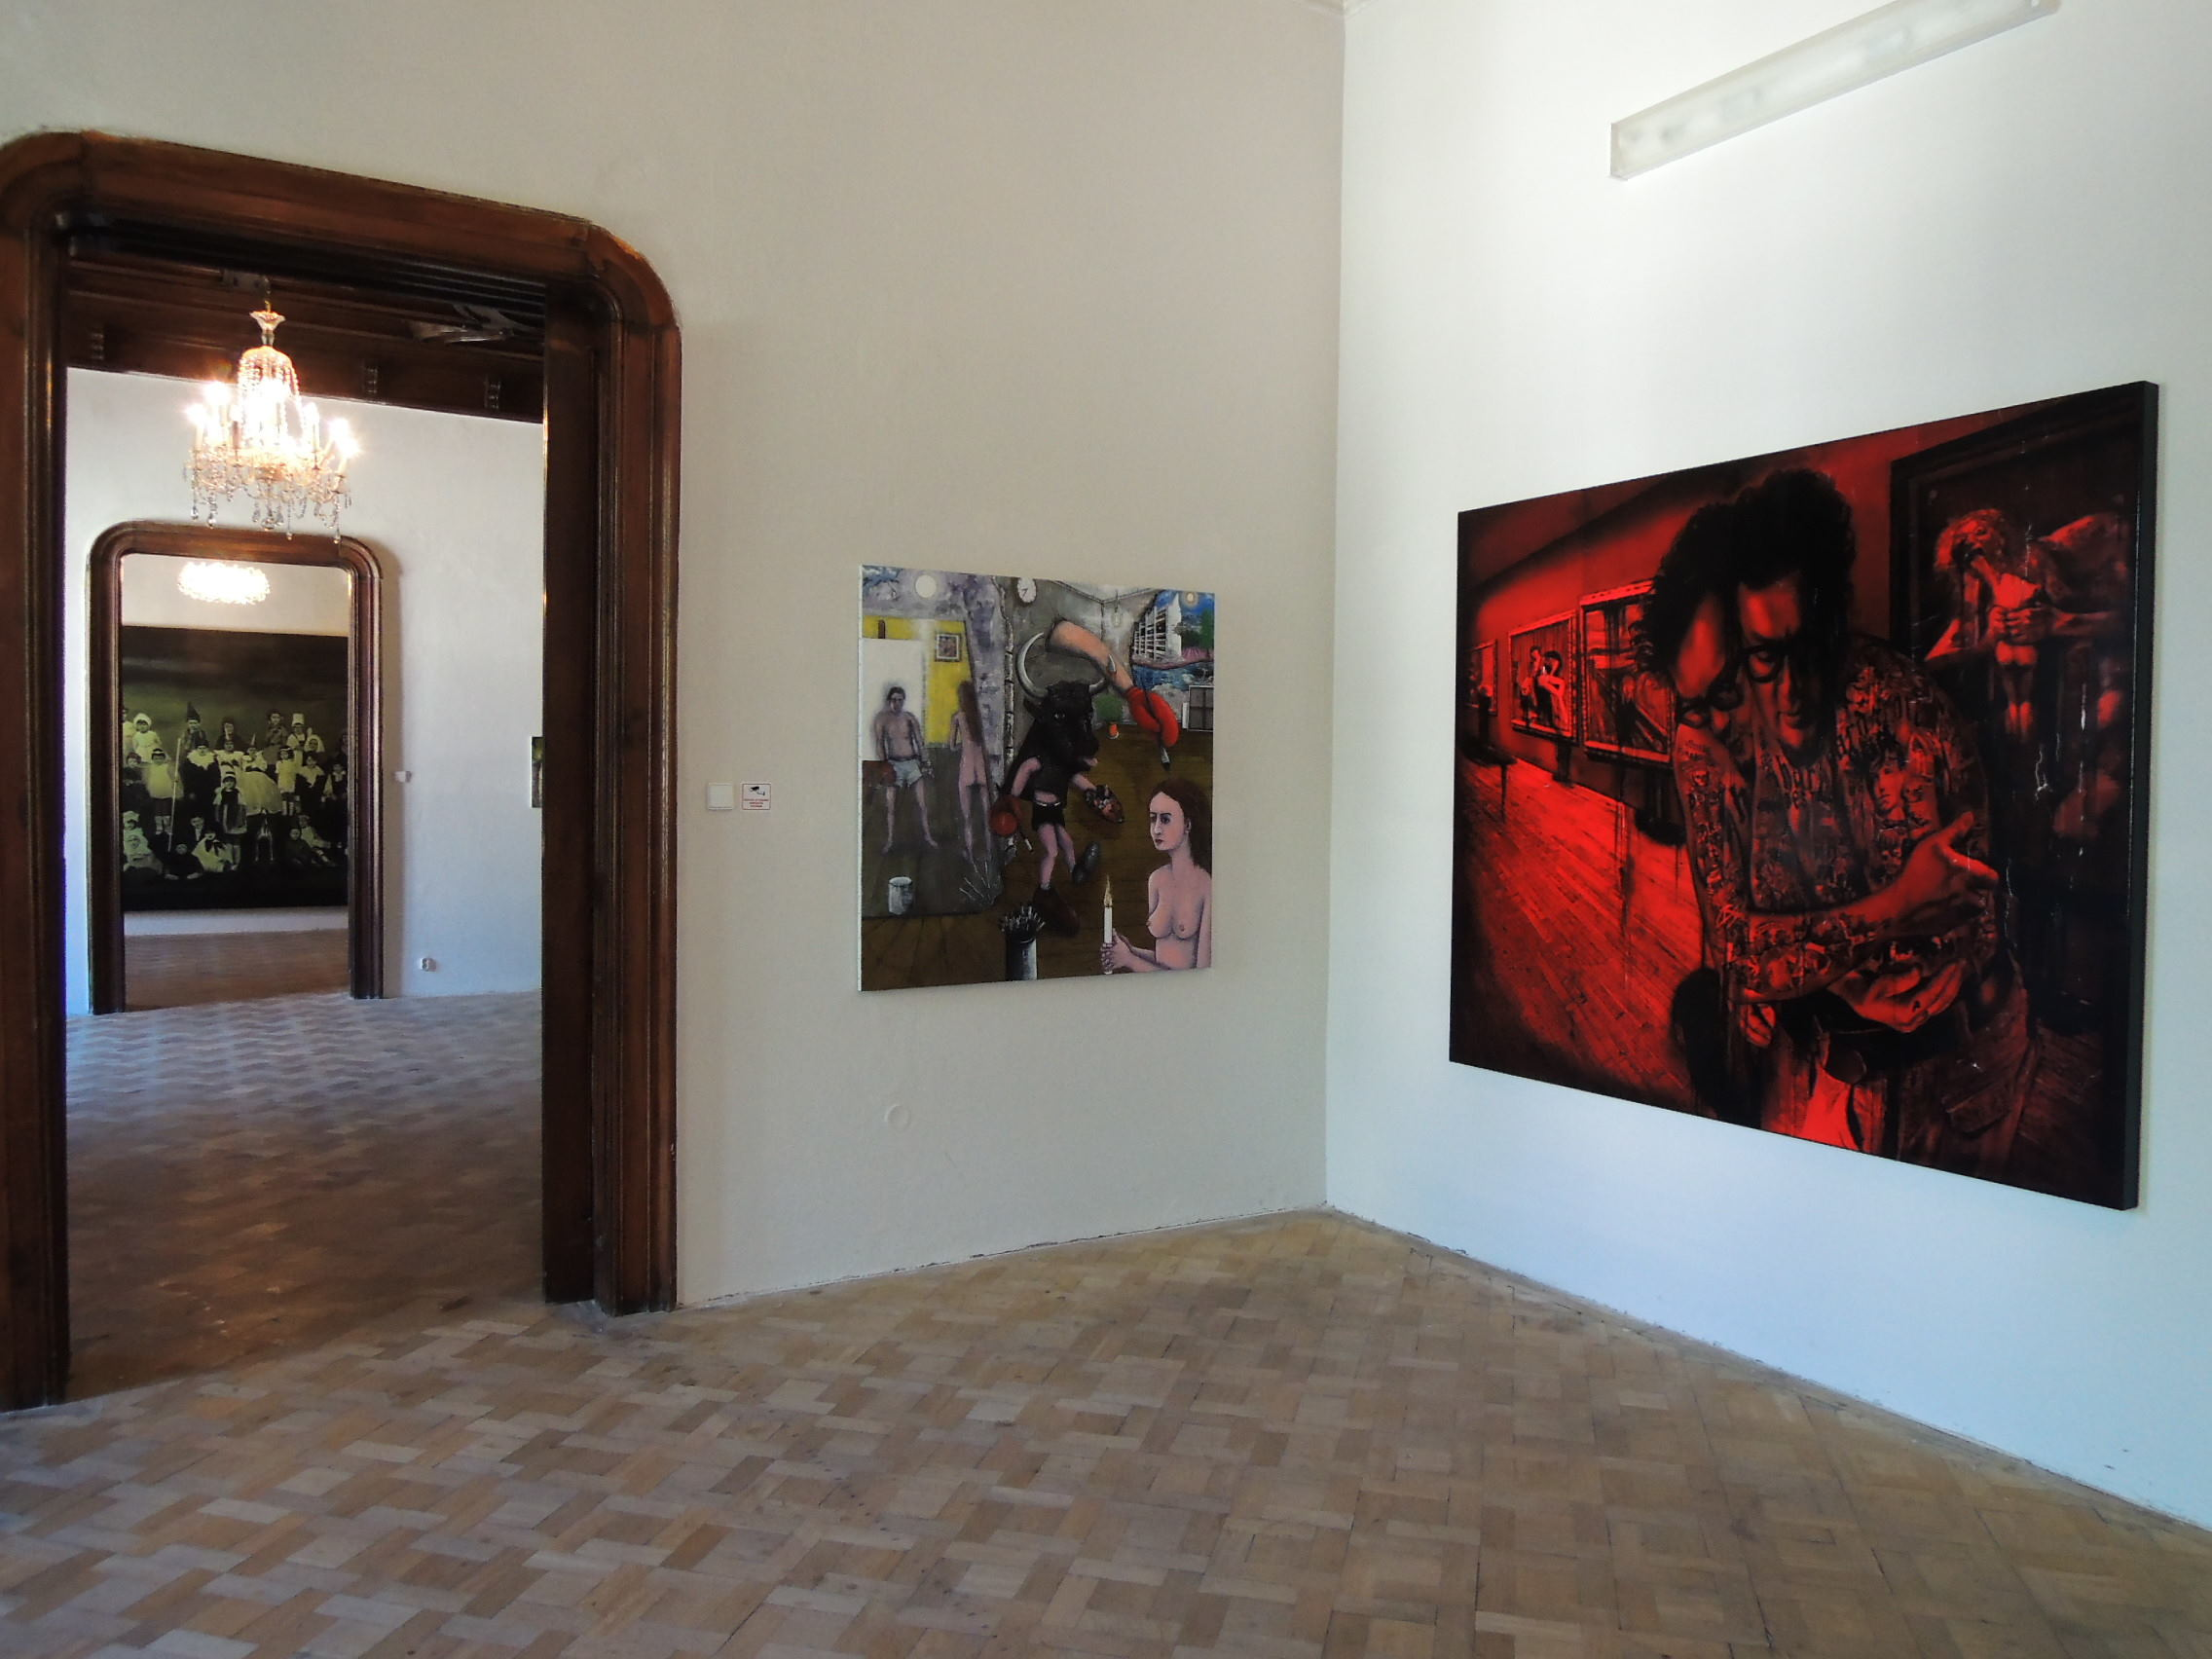 La Belle Peinture 2 , Bratislava (SK), Pisztory Palace.Curators : Eva Hober and Ivan Jançar.Artists in view: Claire Tabouret, Eric Corne